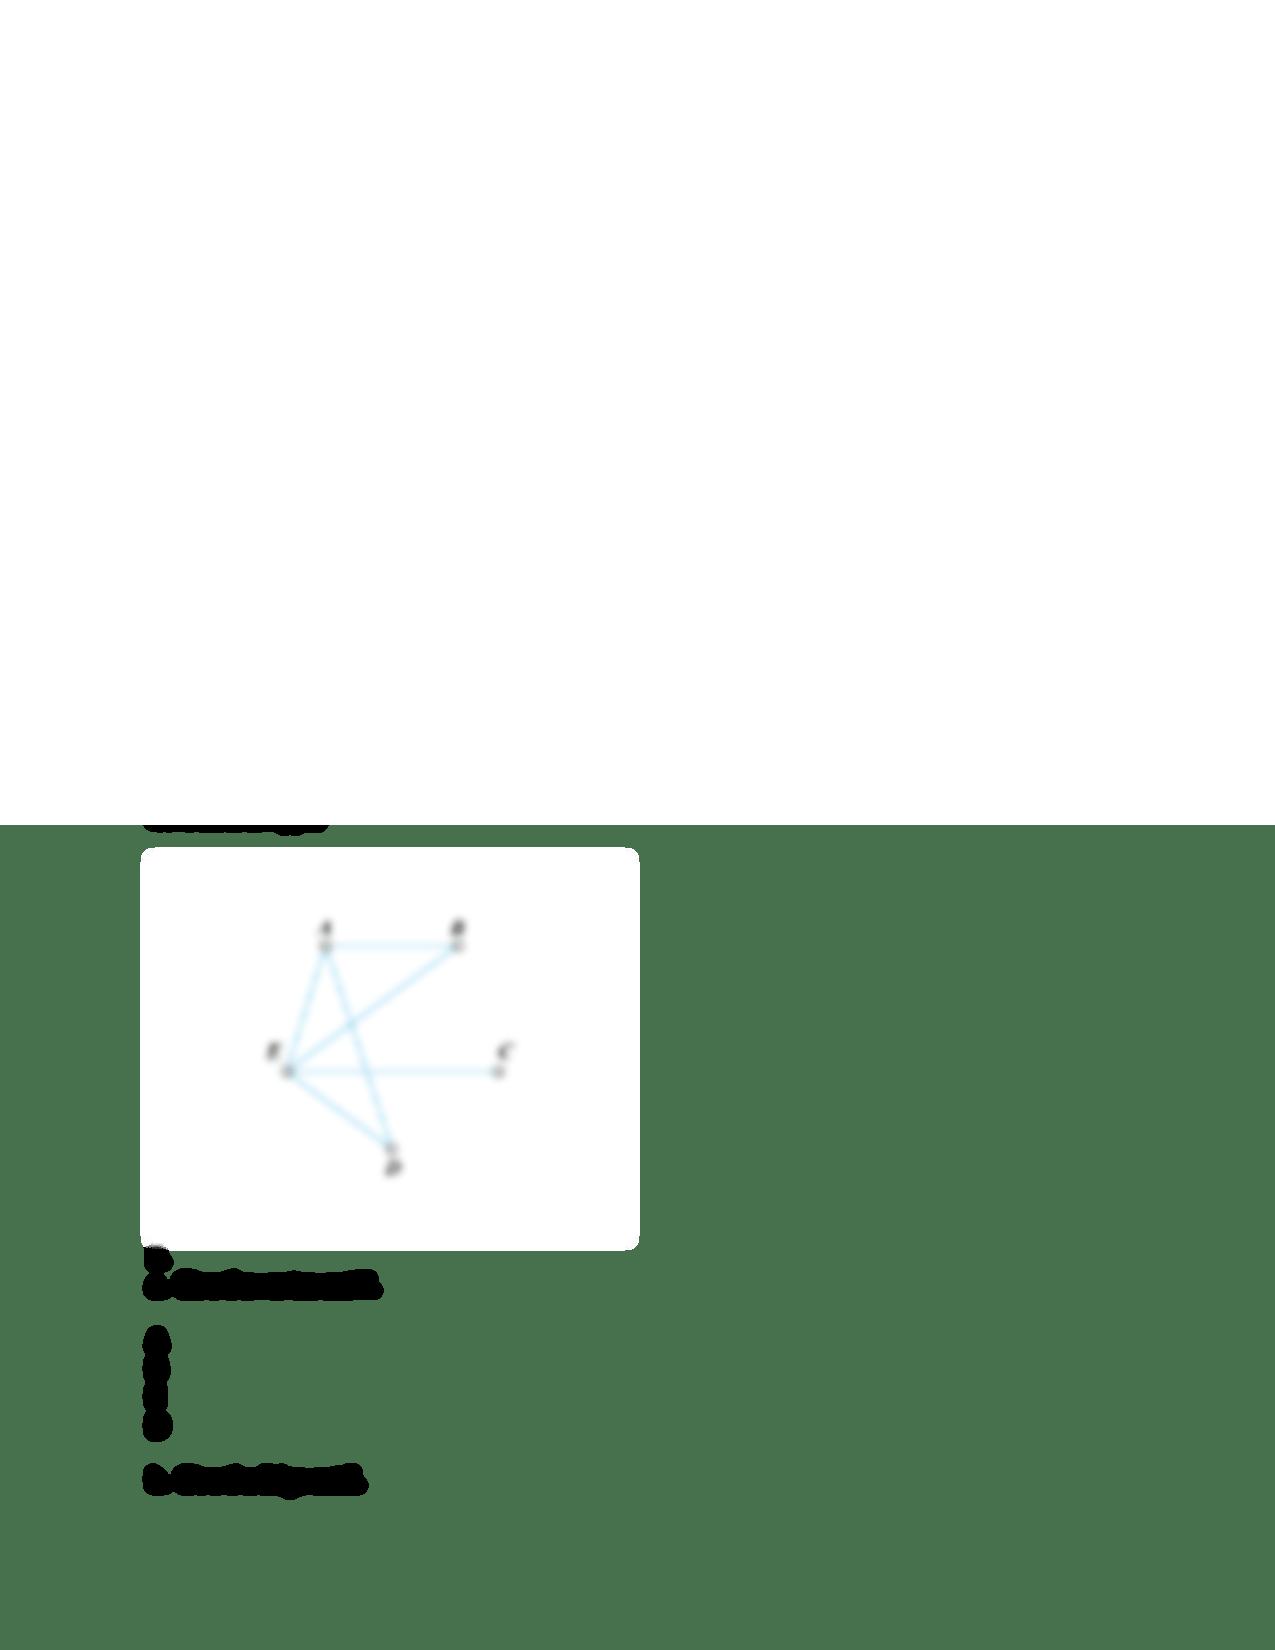 Solution Math Worksheet 1